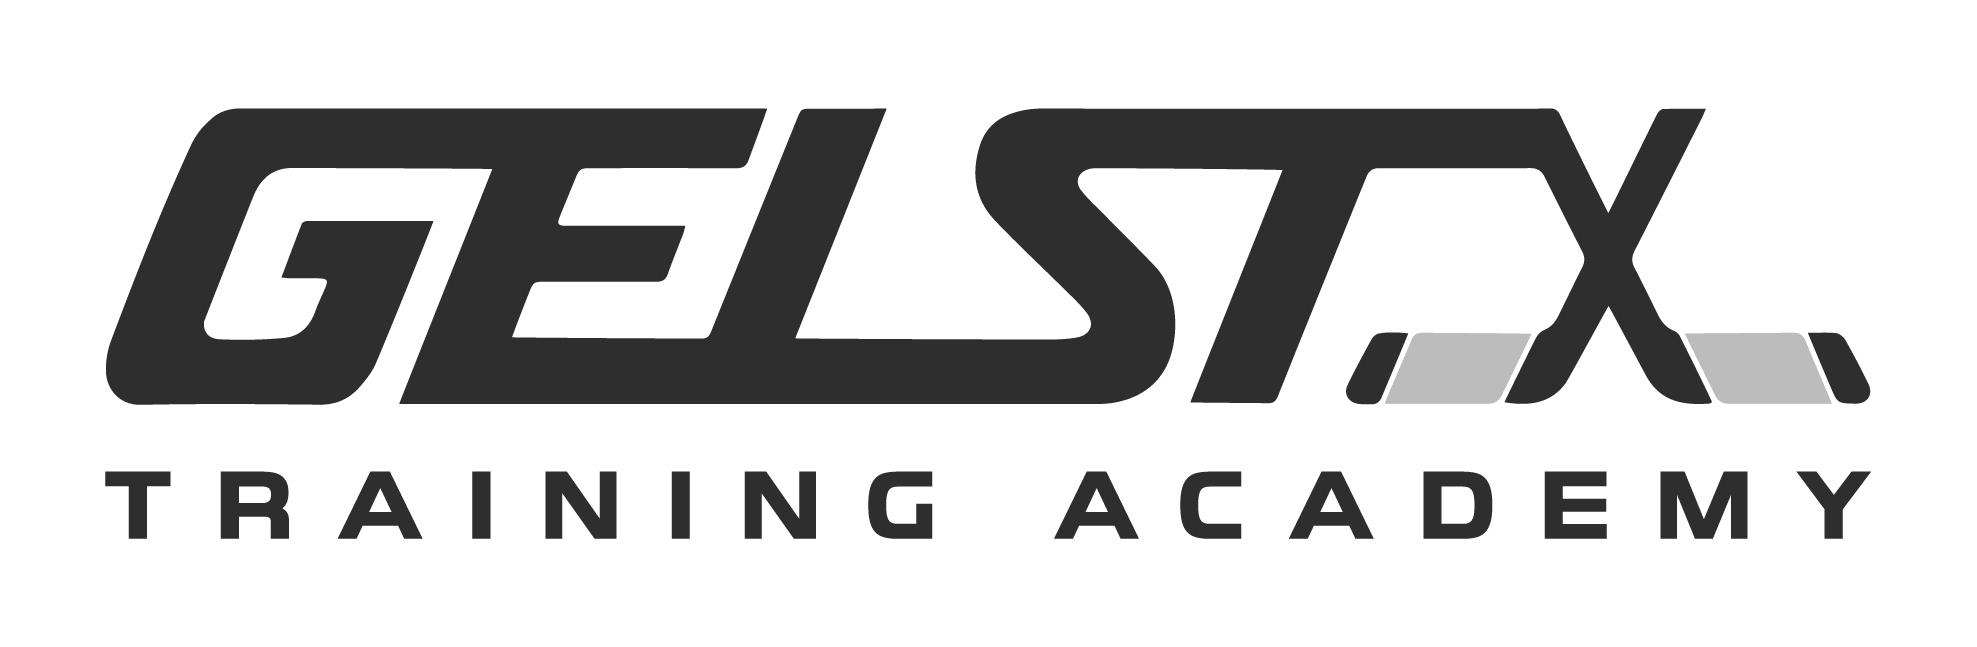 logo of Gelstx Training Academy